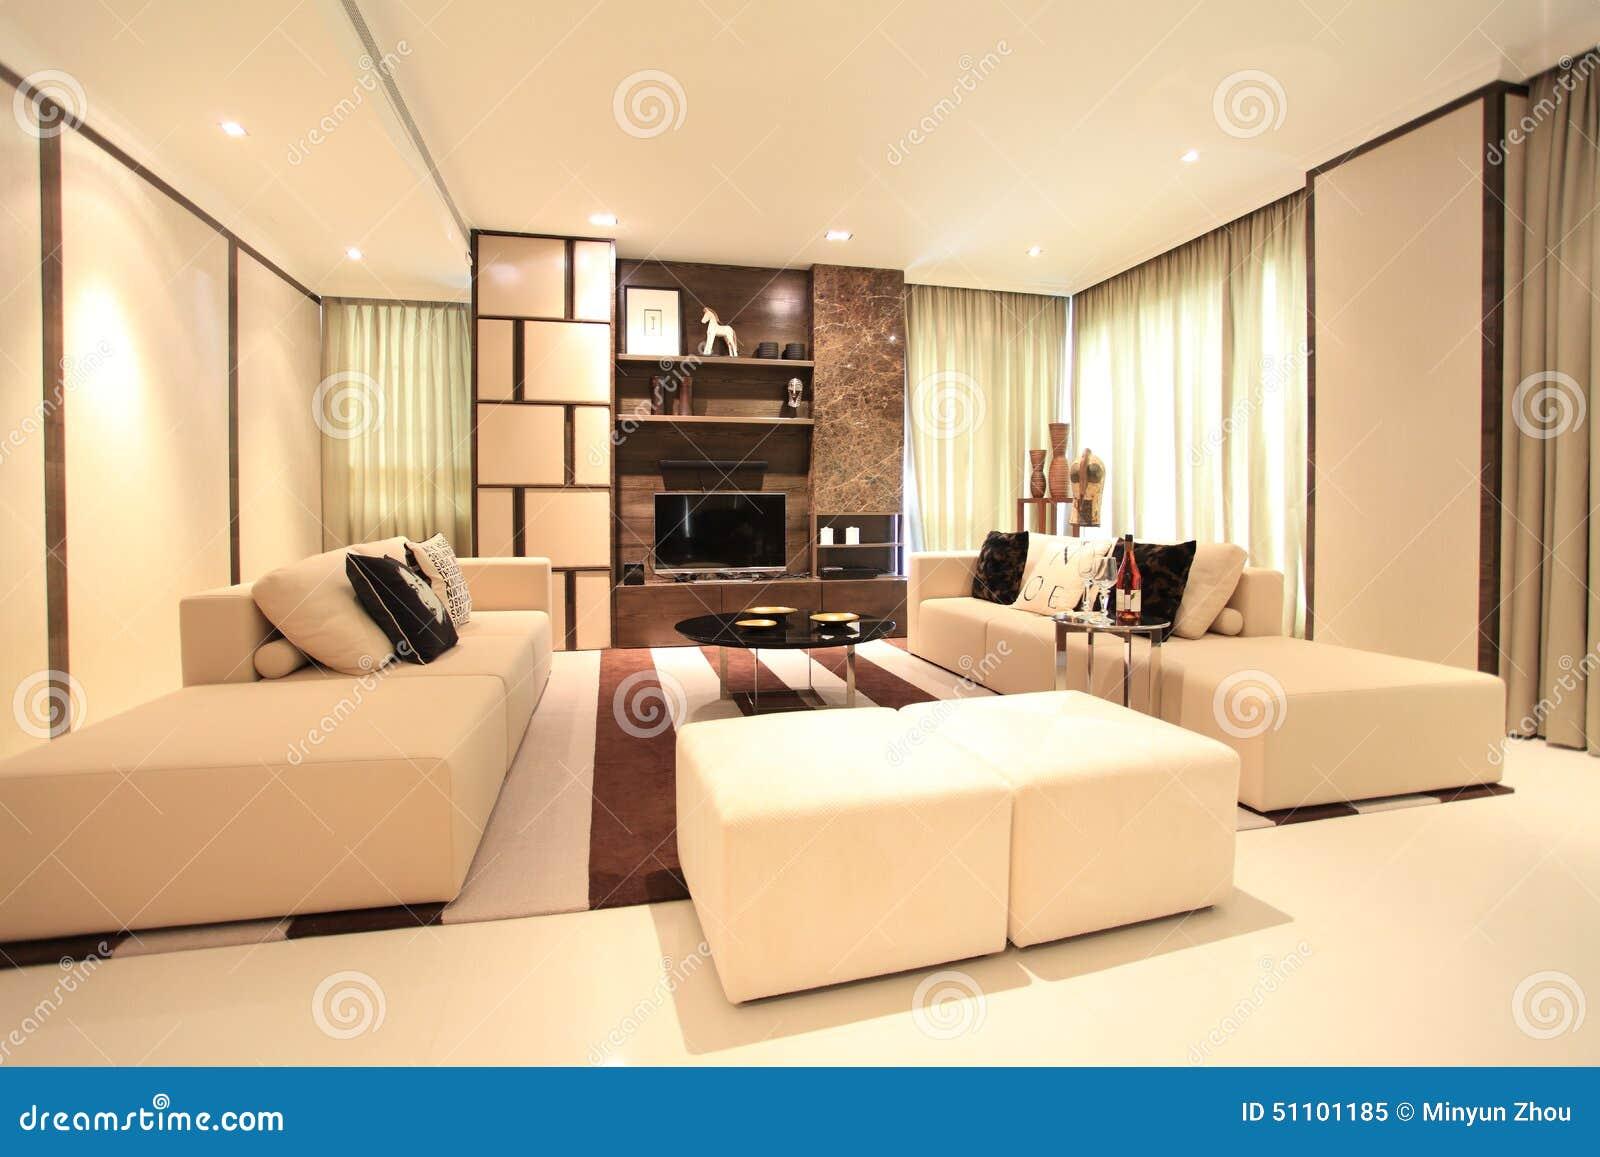 Living Room In Luxury Condo Kuala Lumpur Editorial Image